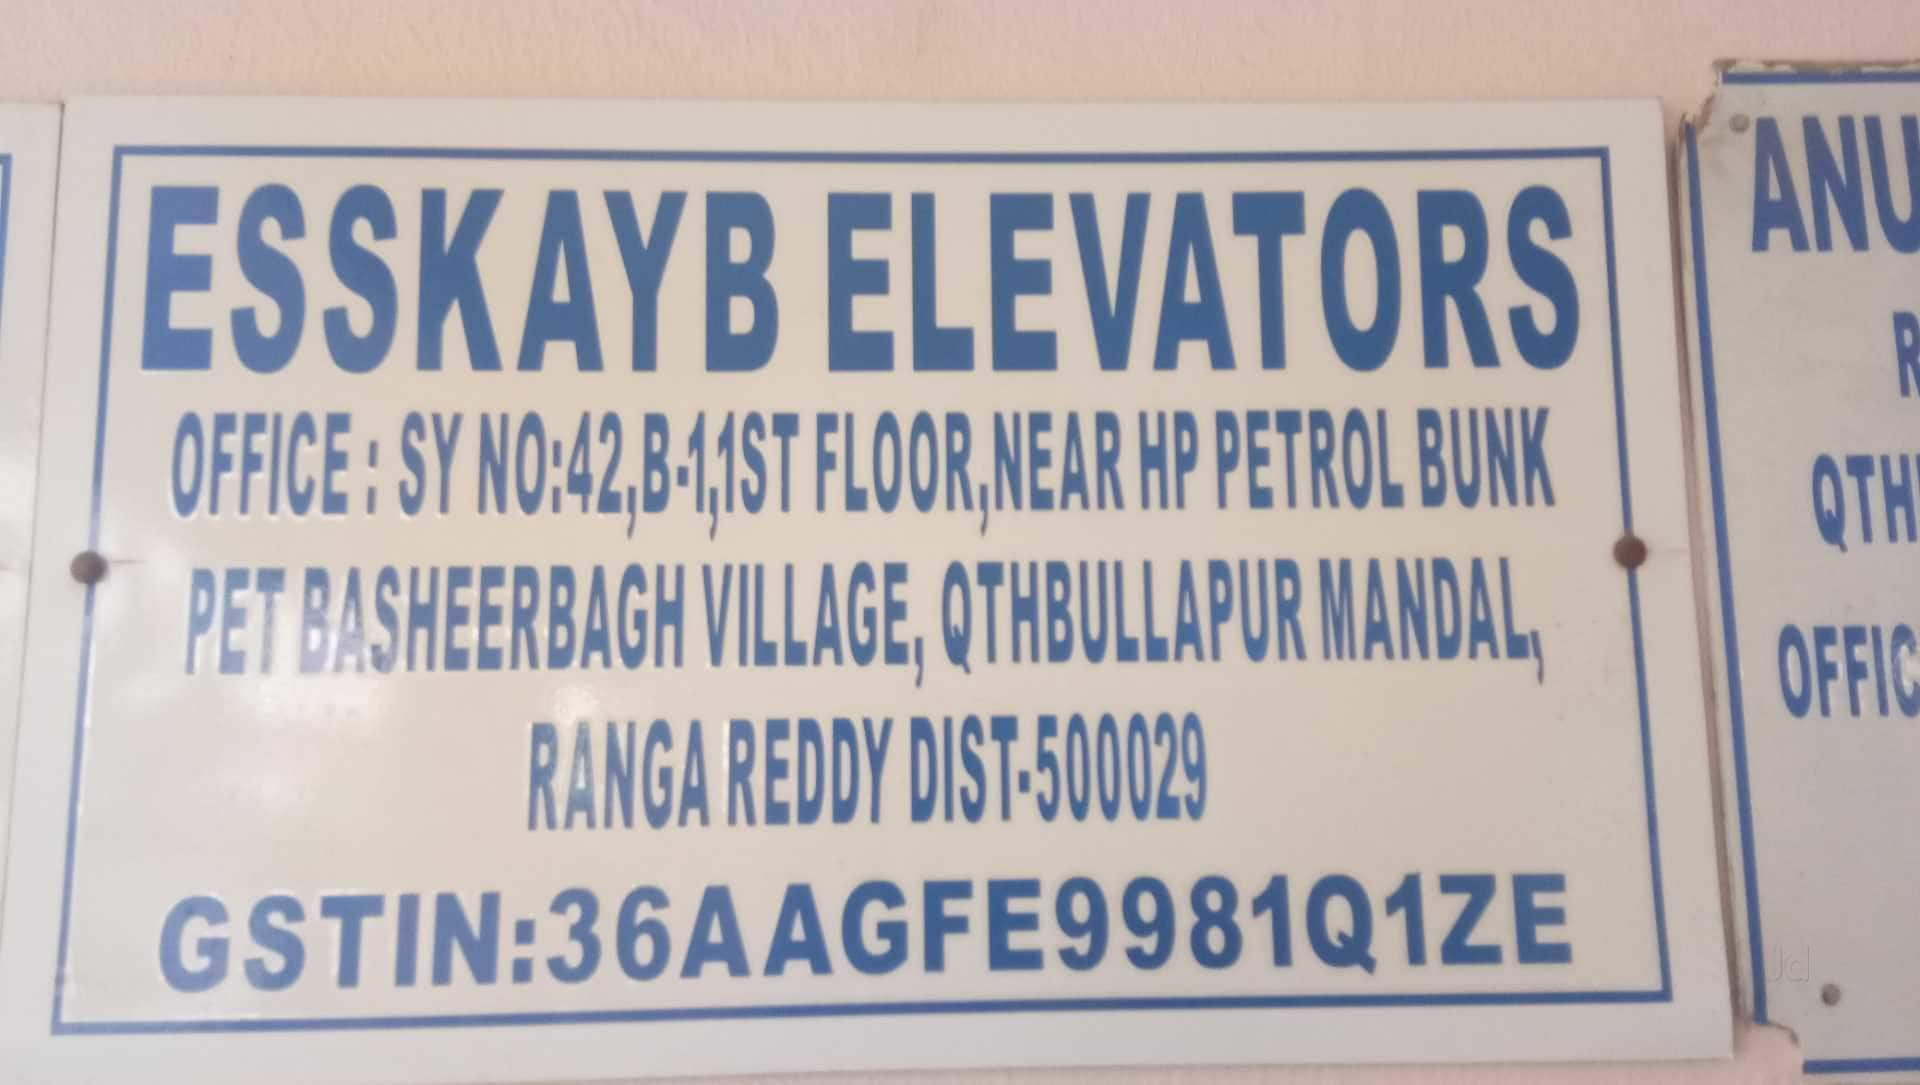 Top 100 Elevator Repair Services in Hyderabad - Best Lift Service